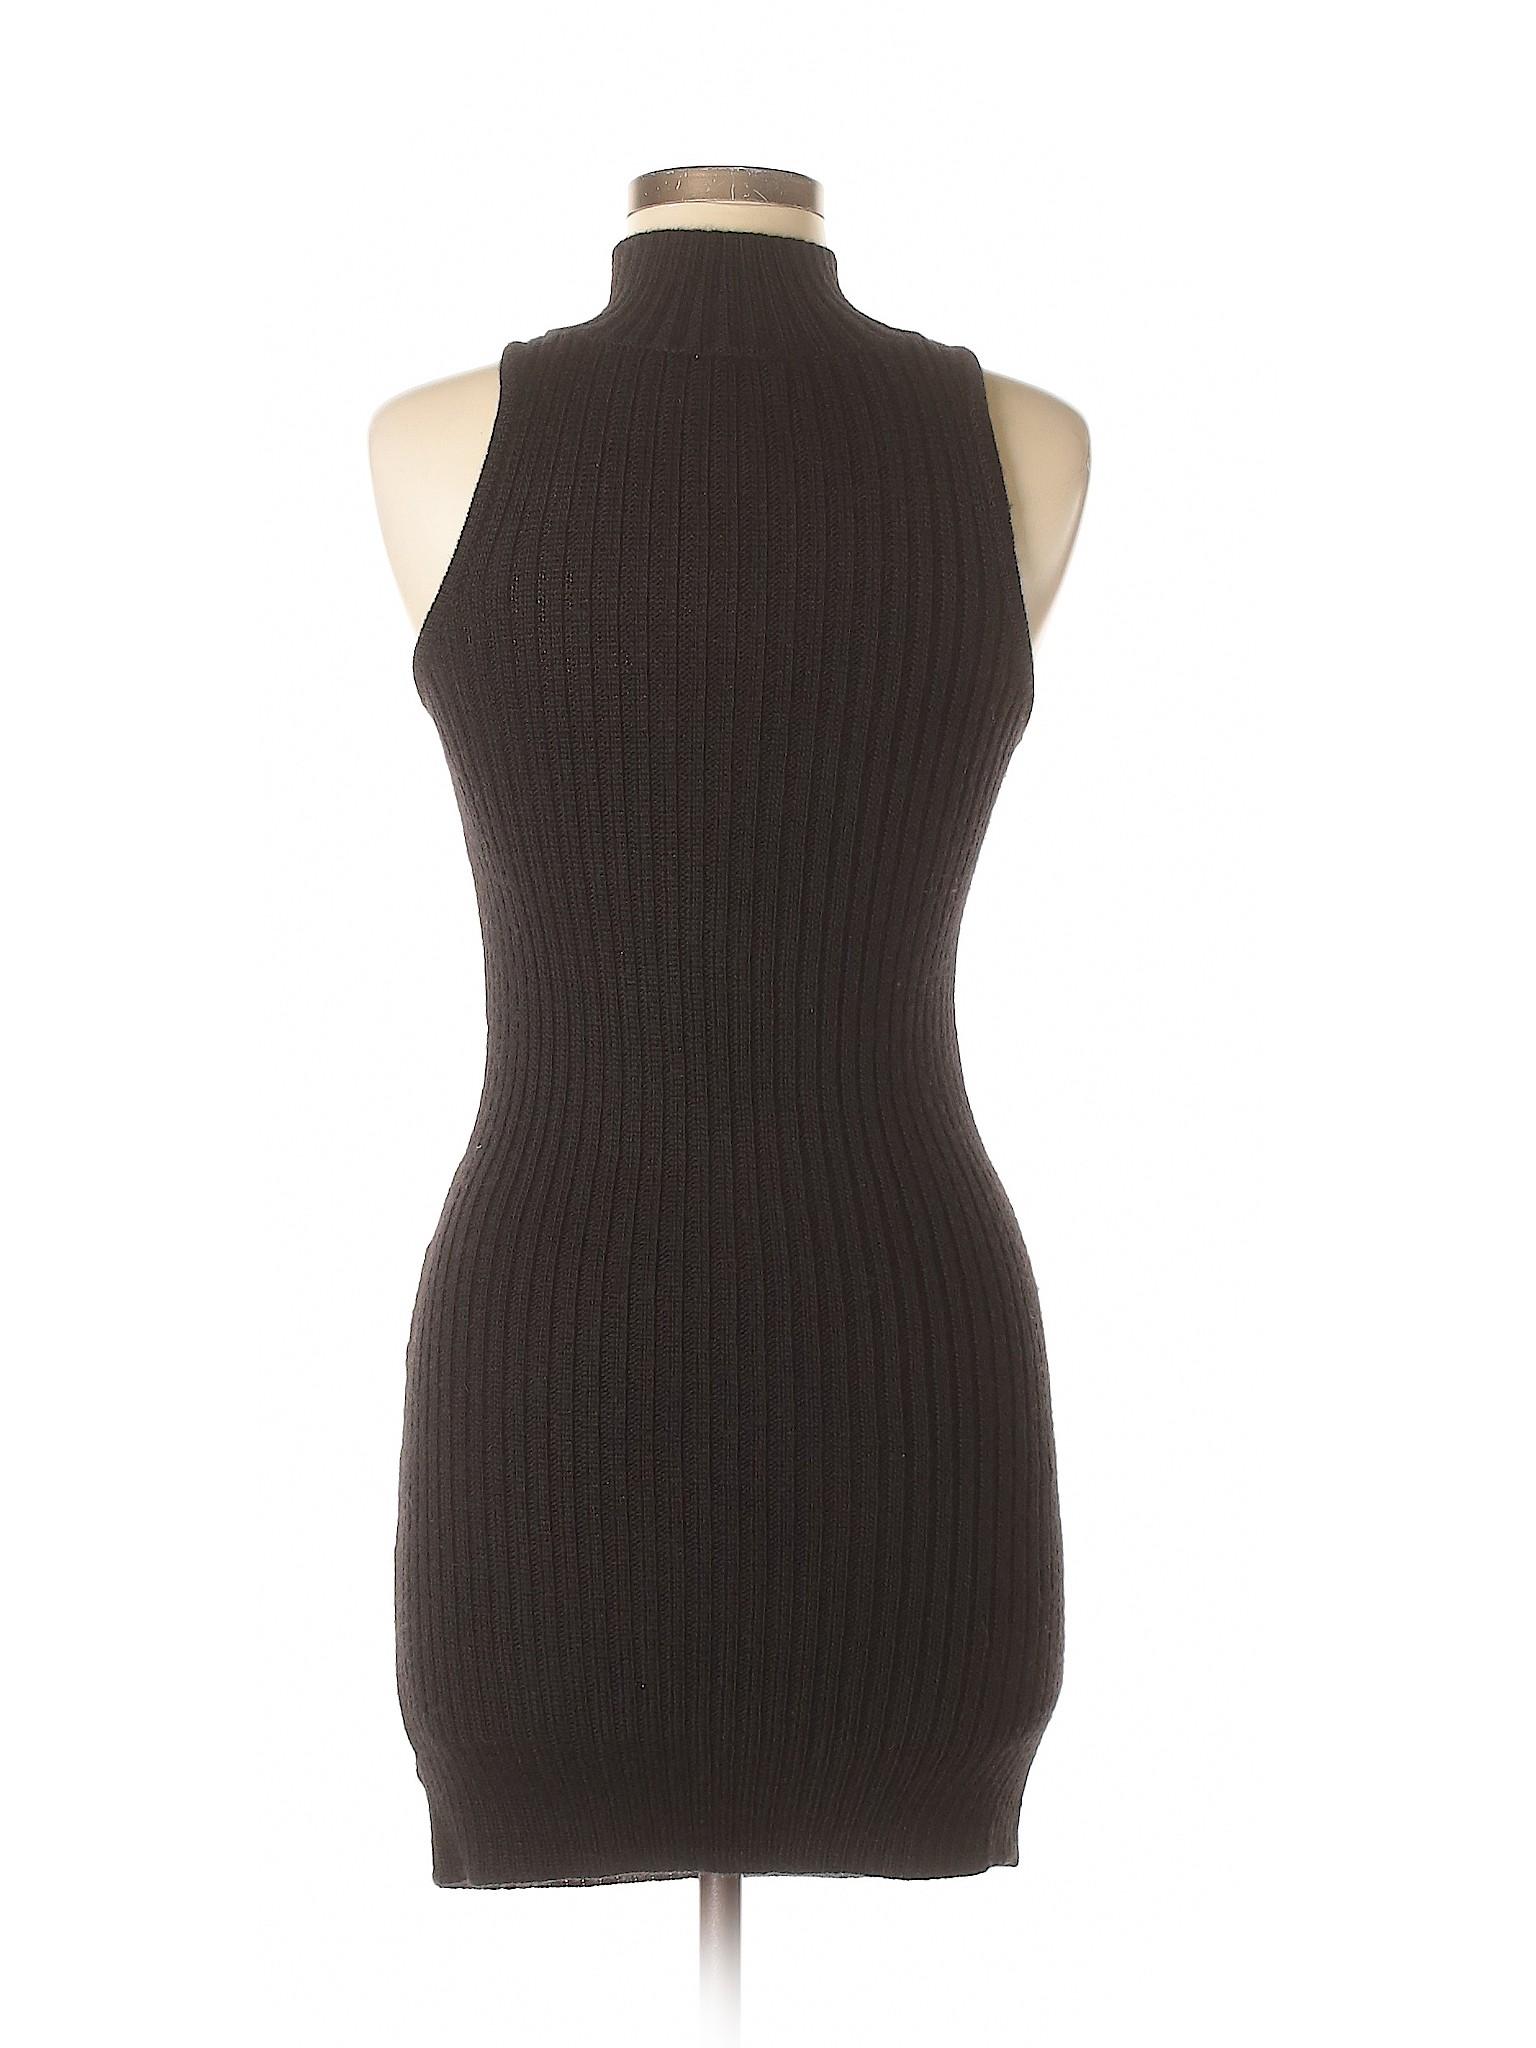 Casual winter Dress Boutique amp; Sparkle Fade vxqId